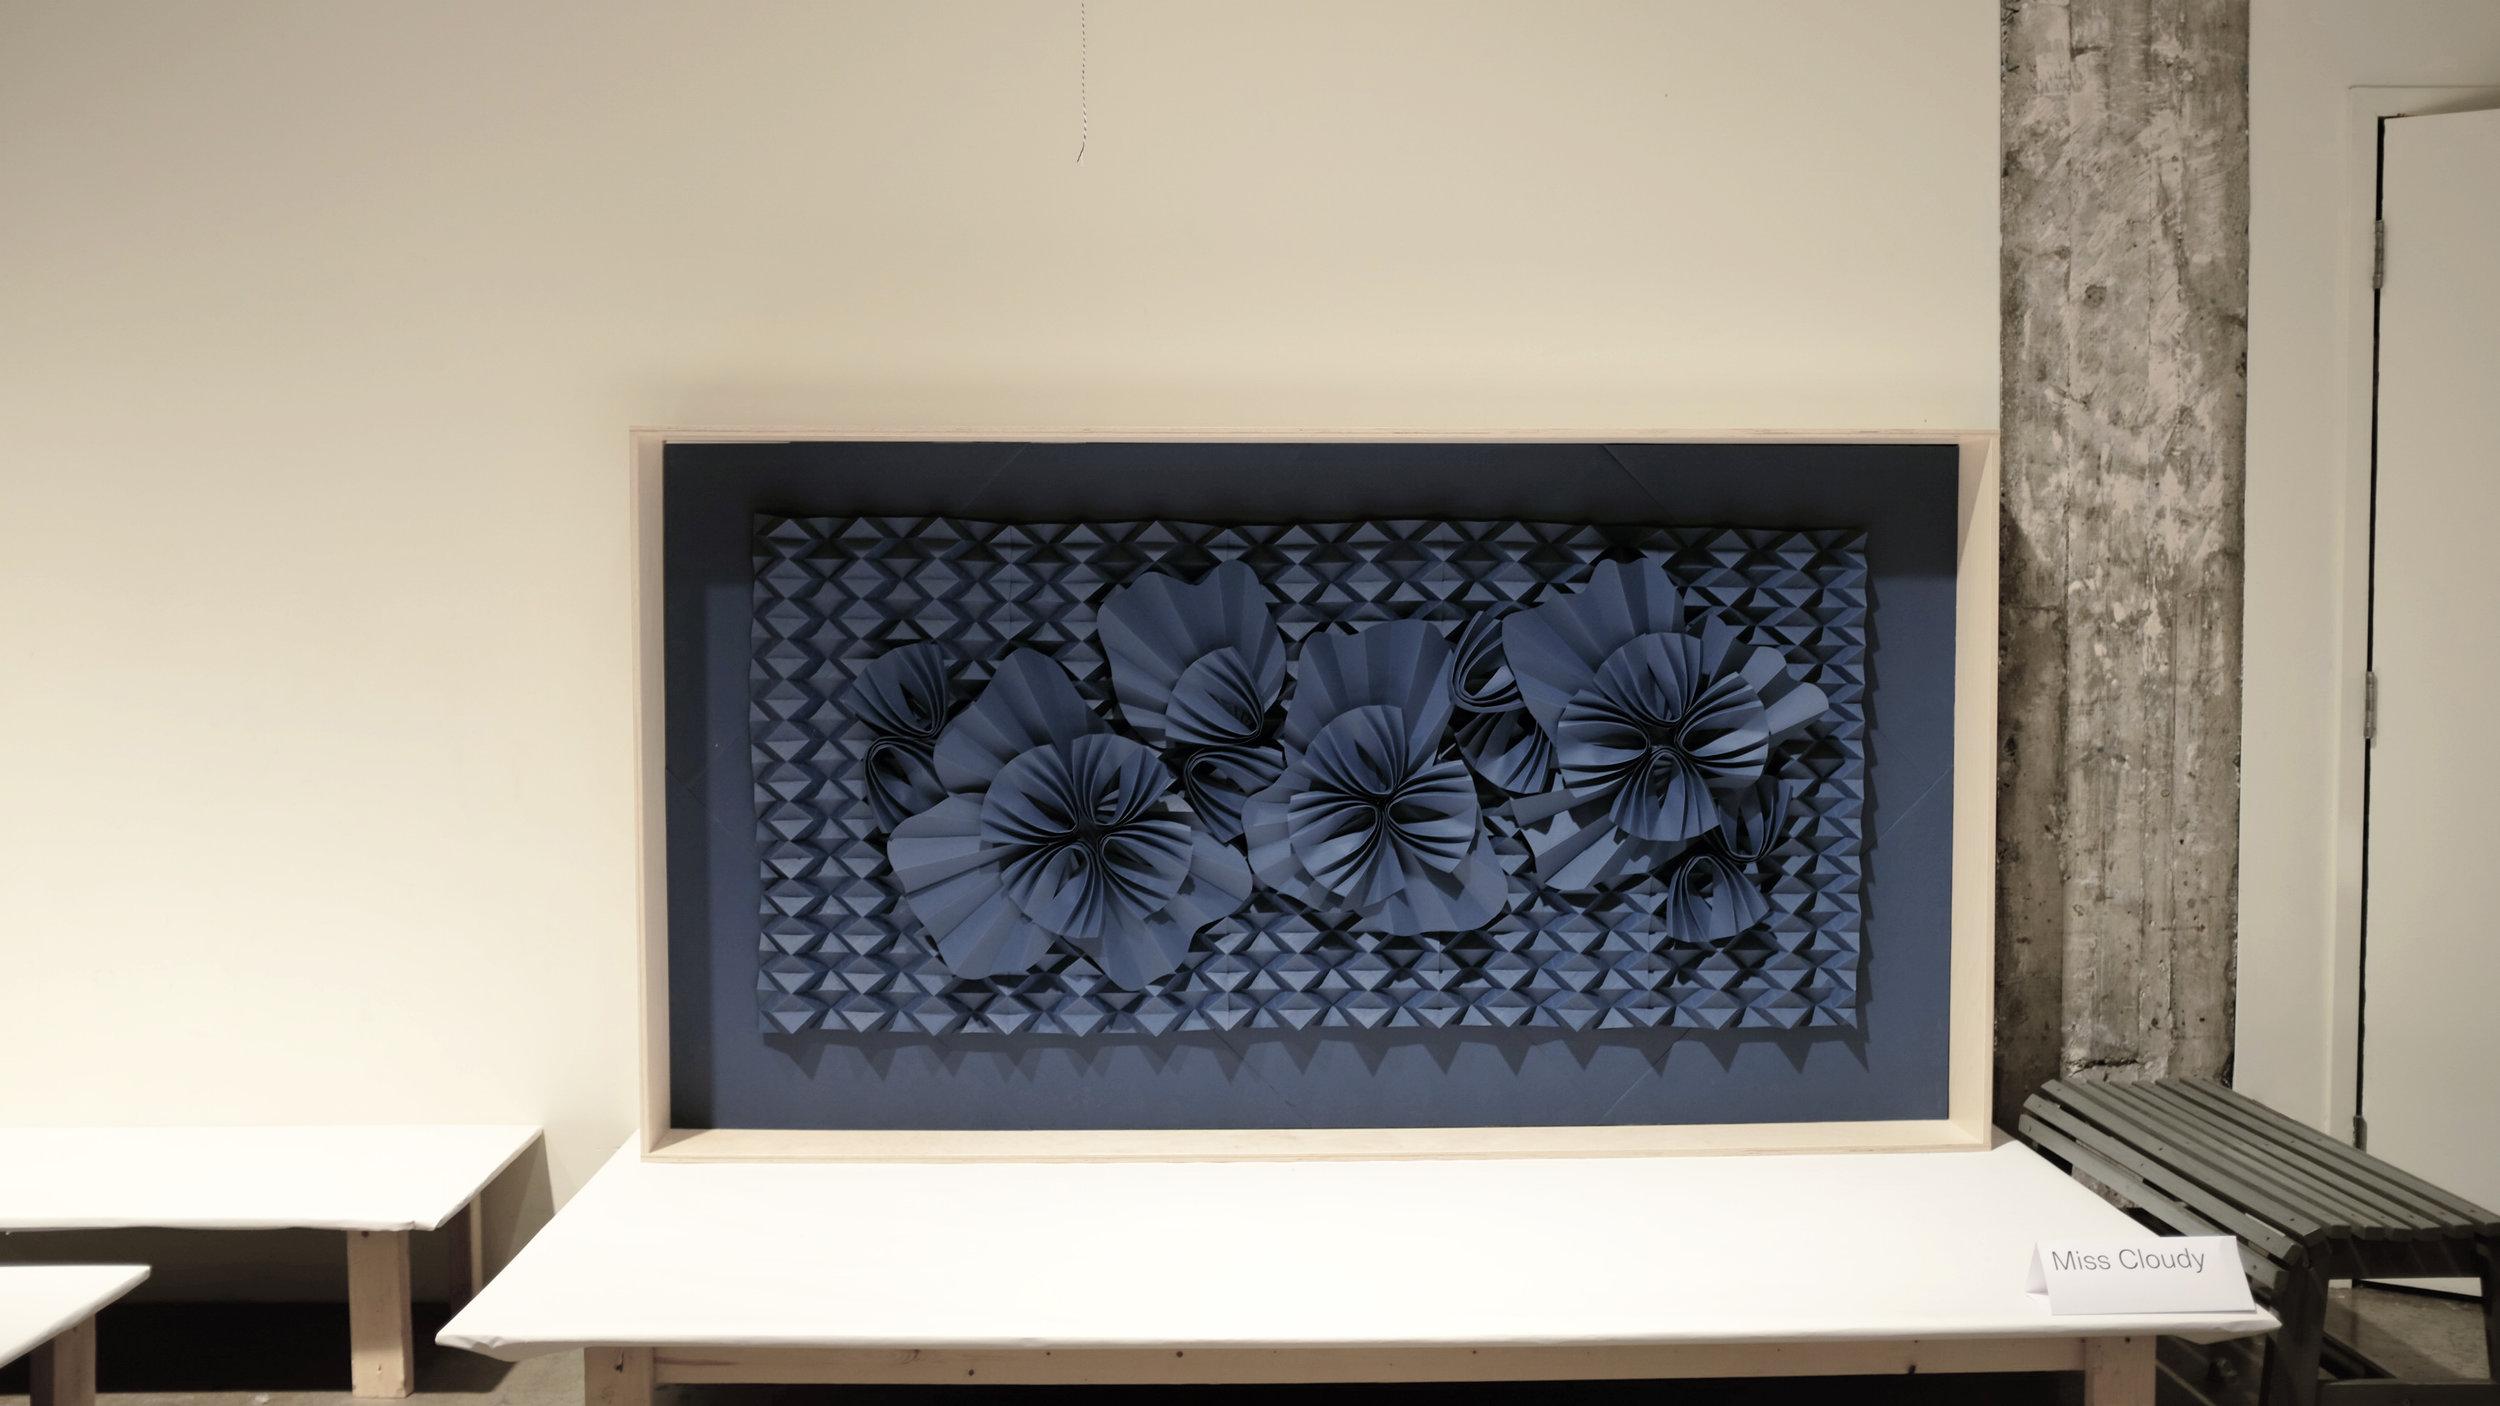 miss-cloudy-pauline-loctin-barrier-installation-paper-art-origami.jpg